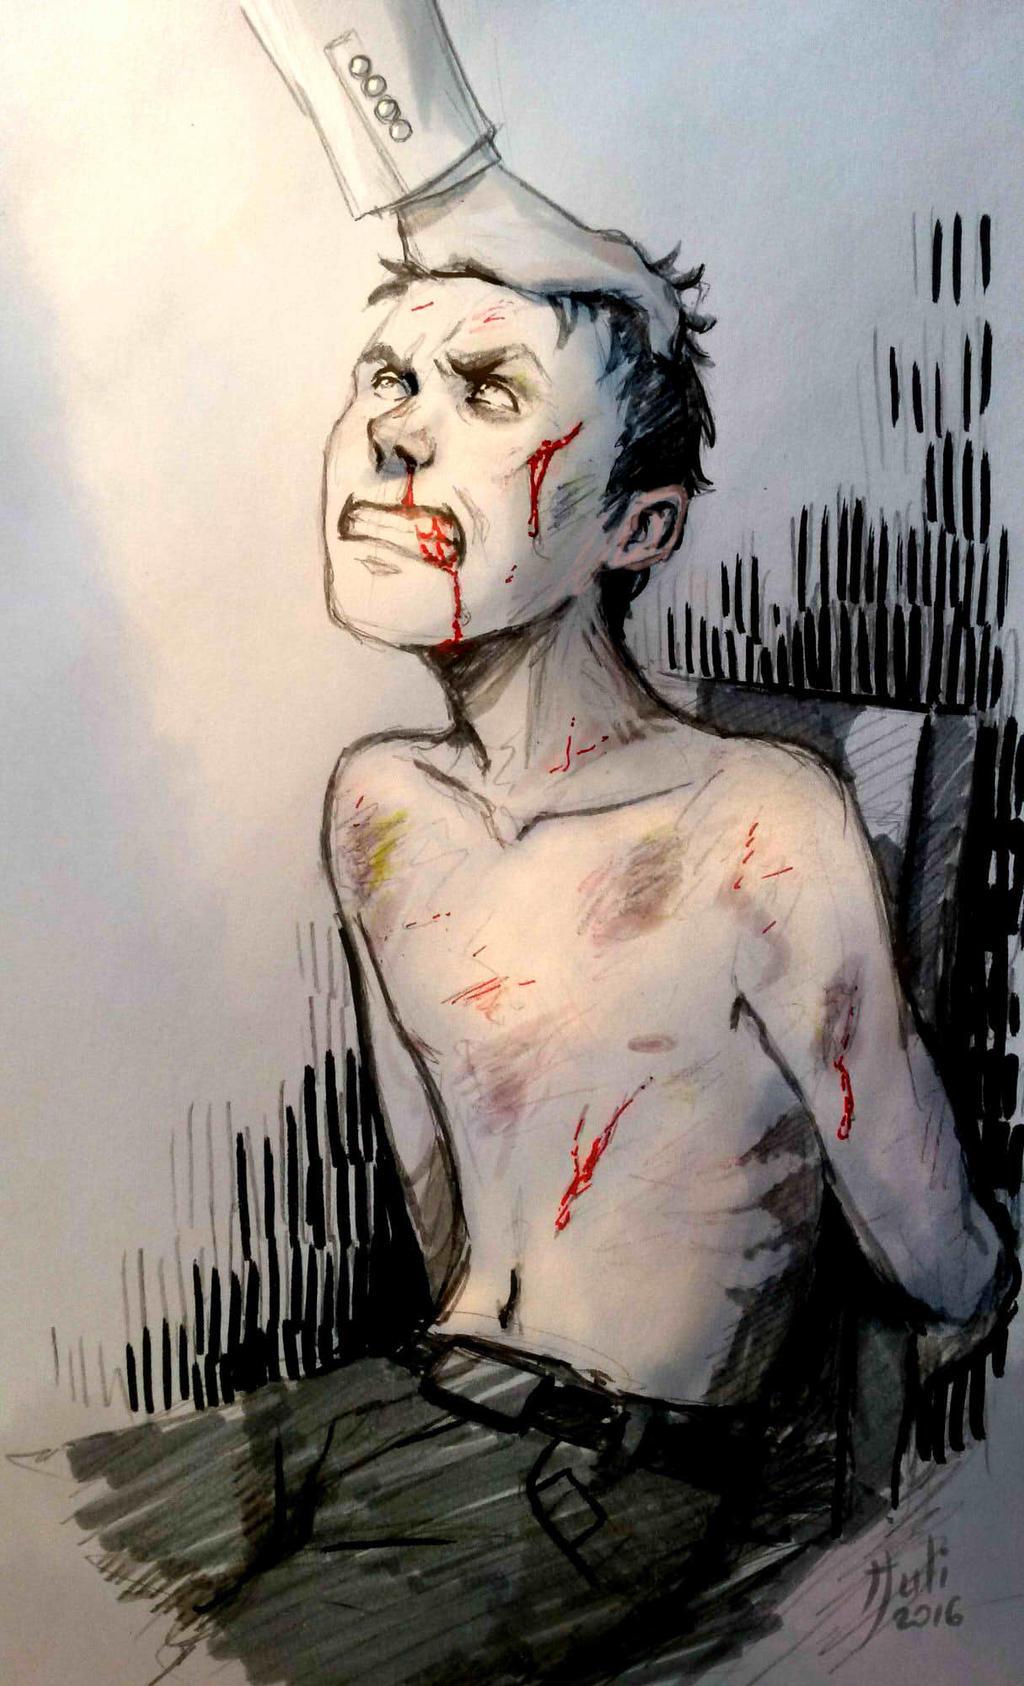 Captive by Juli556